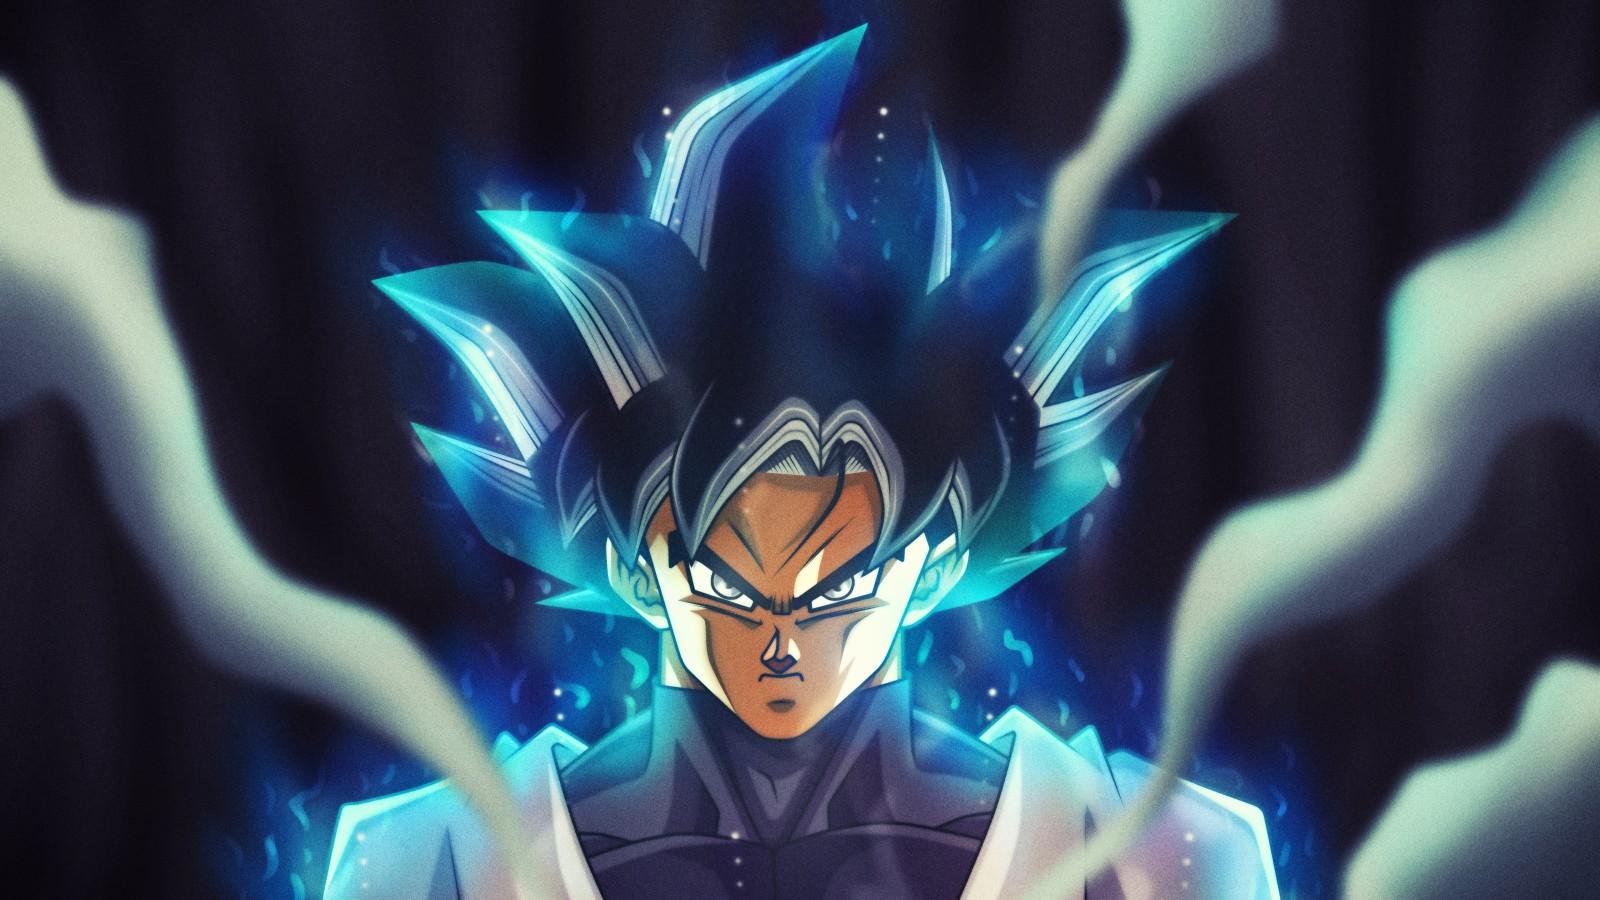 Dragon Ball Z 3d Wallpaper Download Goku Black 5k Wallpapers Hd Wallpapers Id 25508